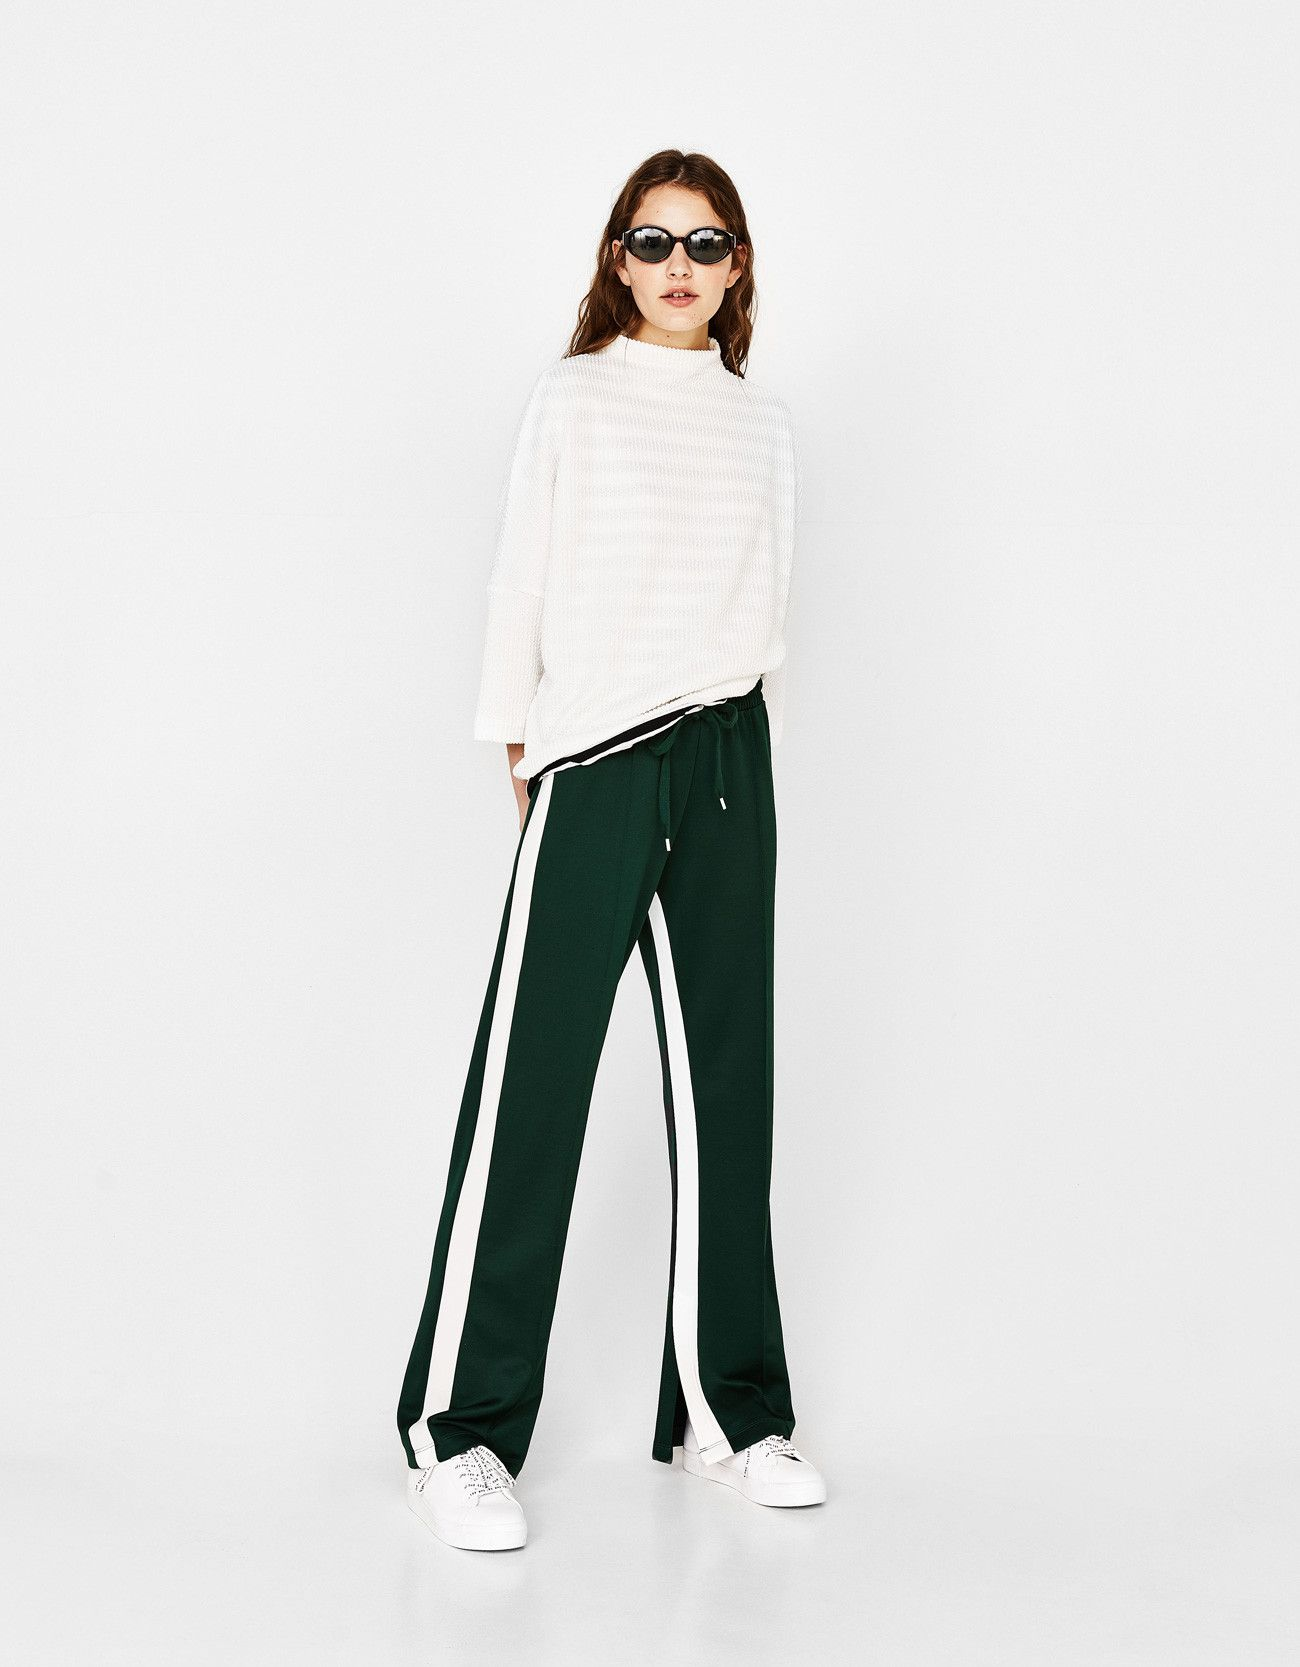 Adidas Adibreak Pantalon Corchetes Shopping Pantalones Deportivos Mujer Pantalones Moda